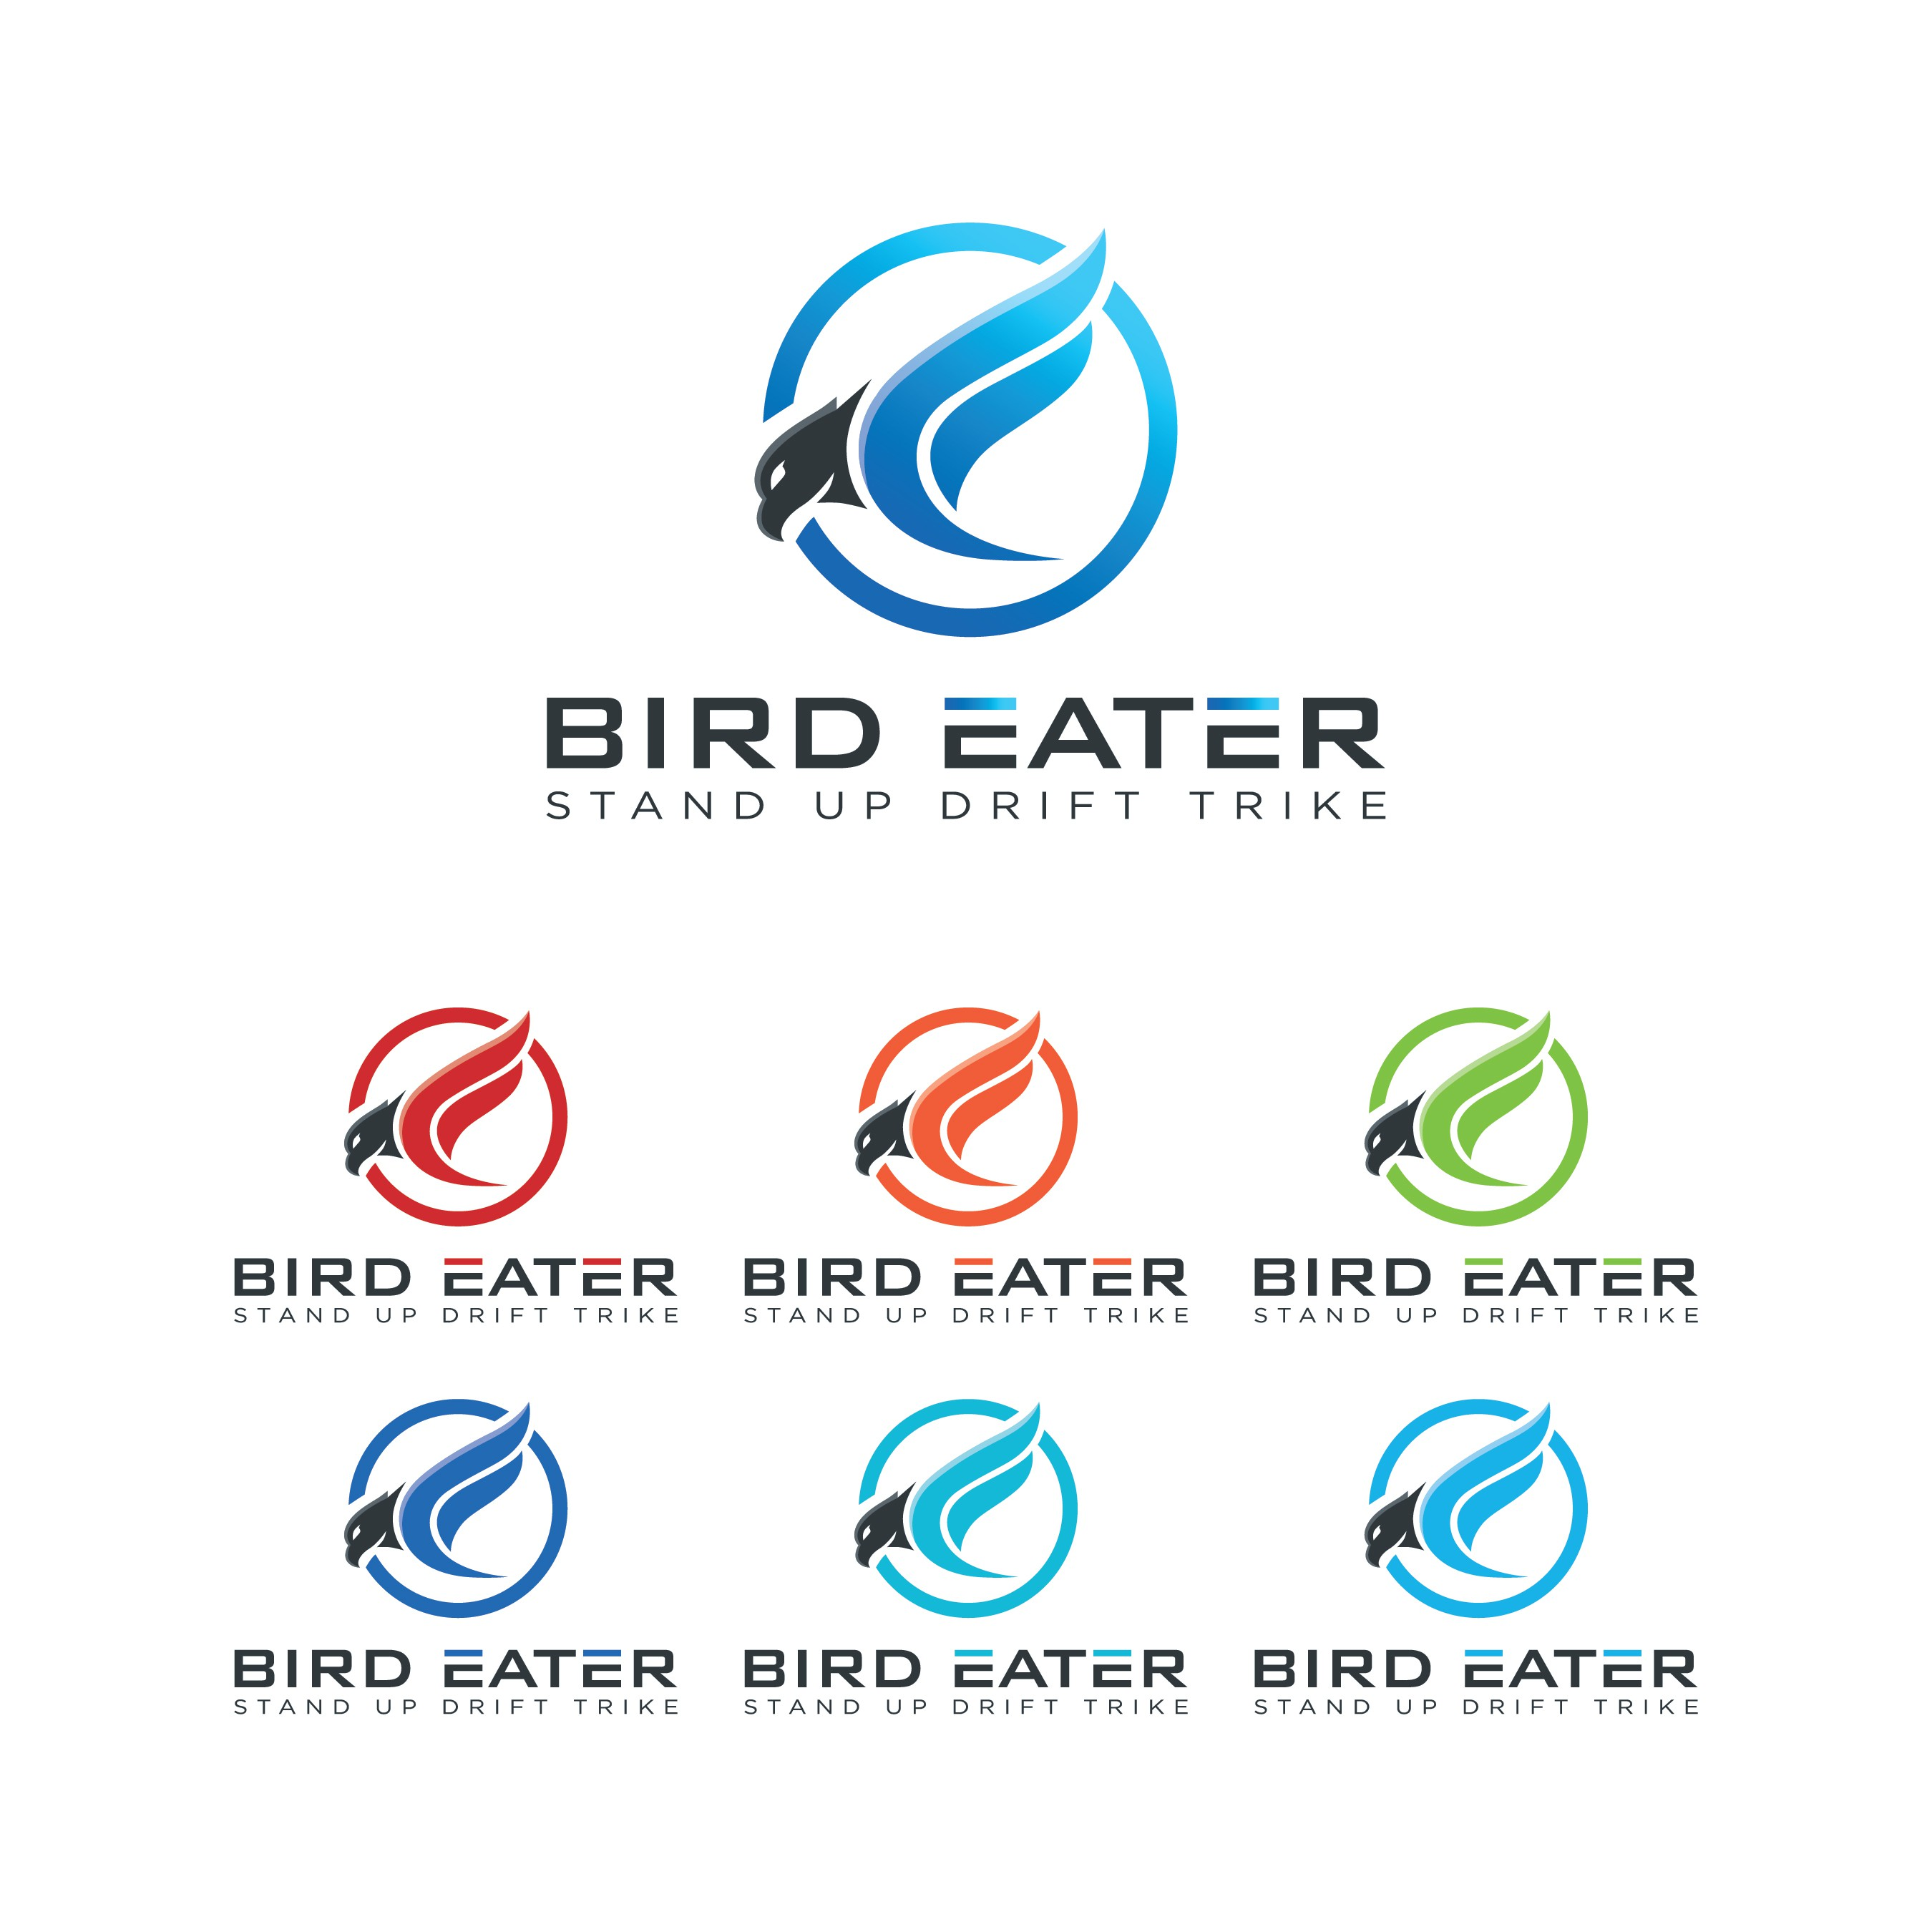 Bird Eater and SUD final logo refinment